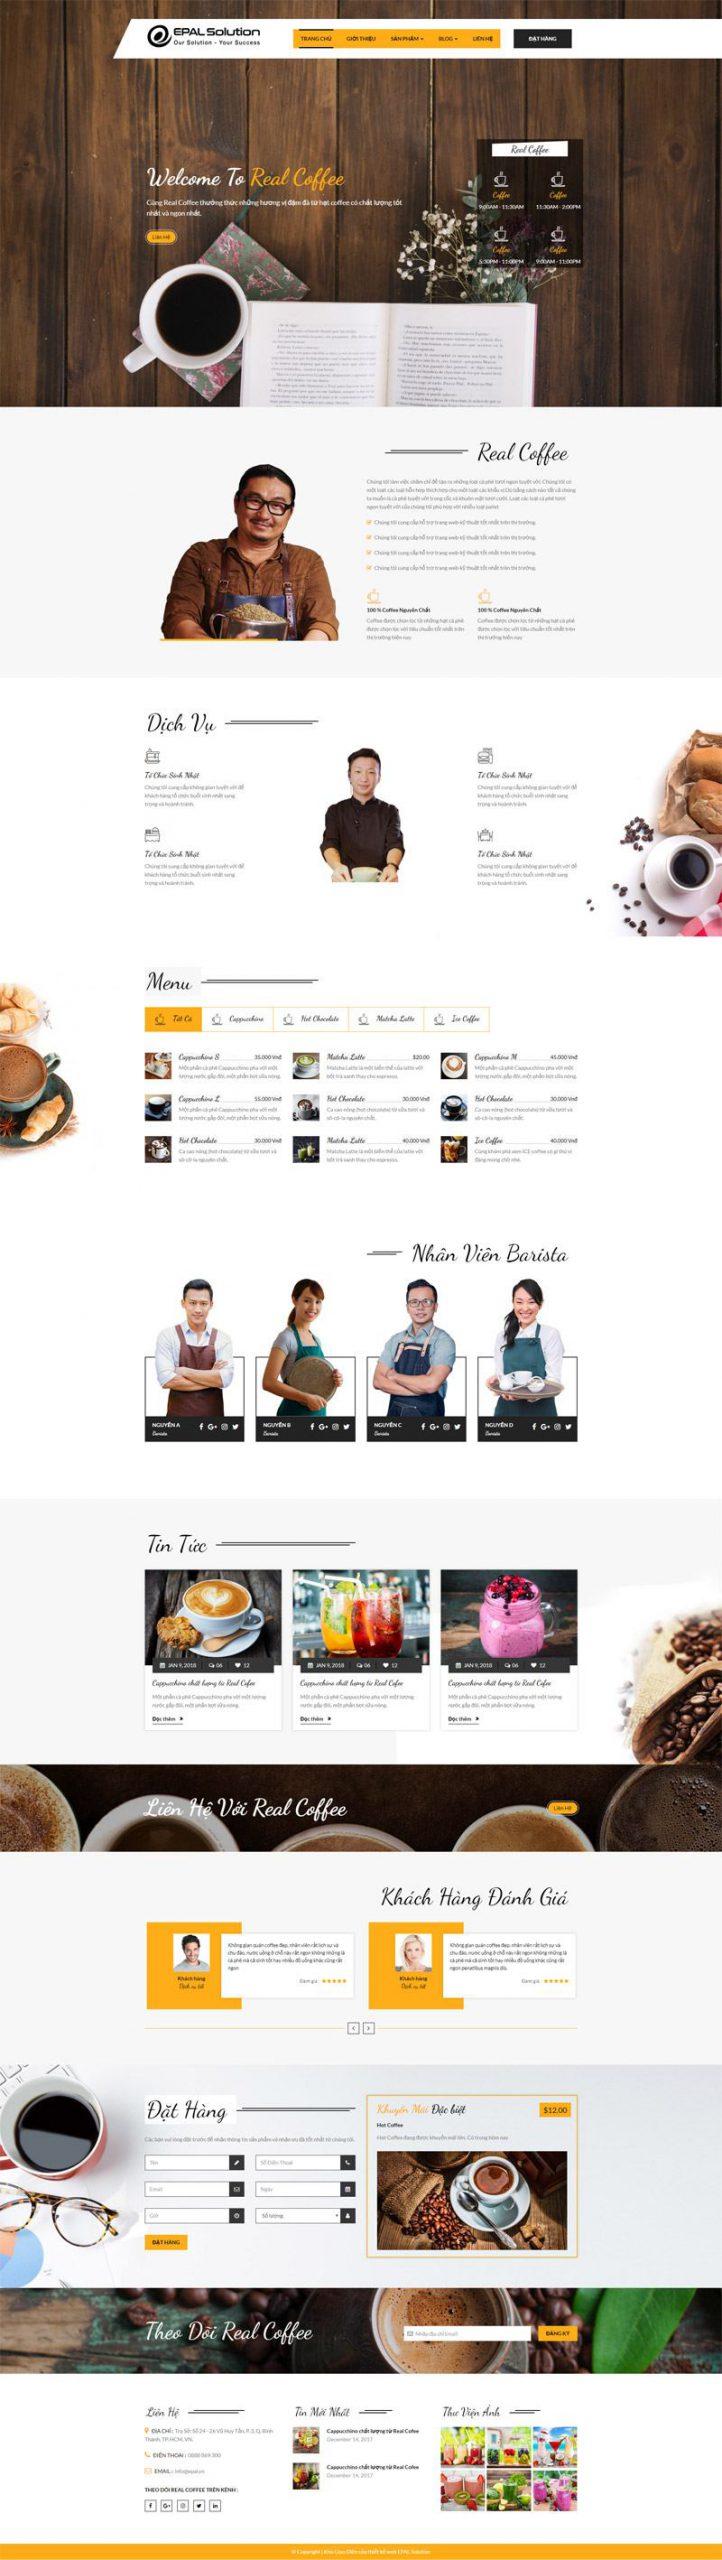 Giao diện website coffee Mẫu 1